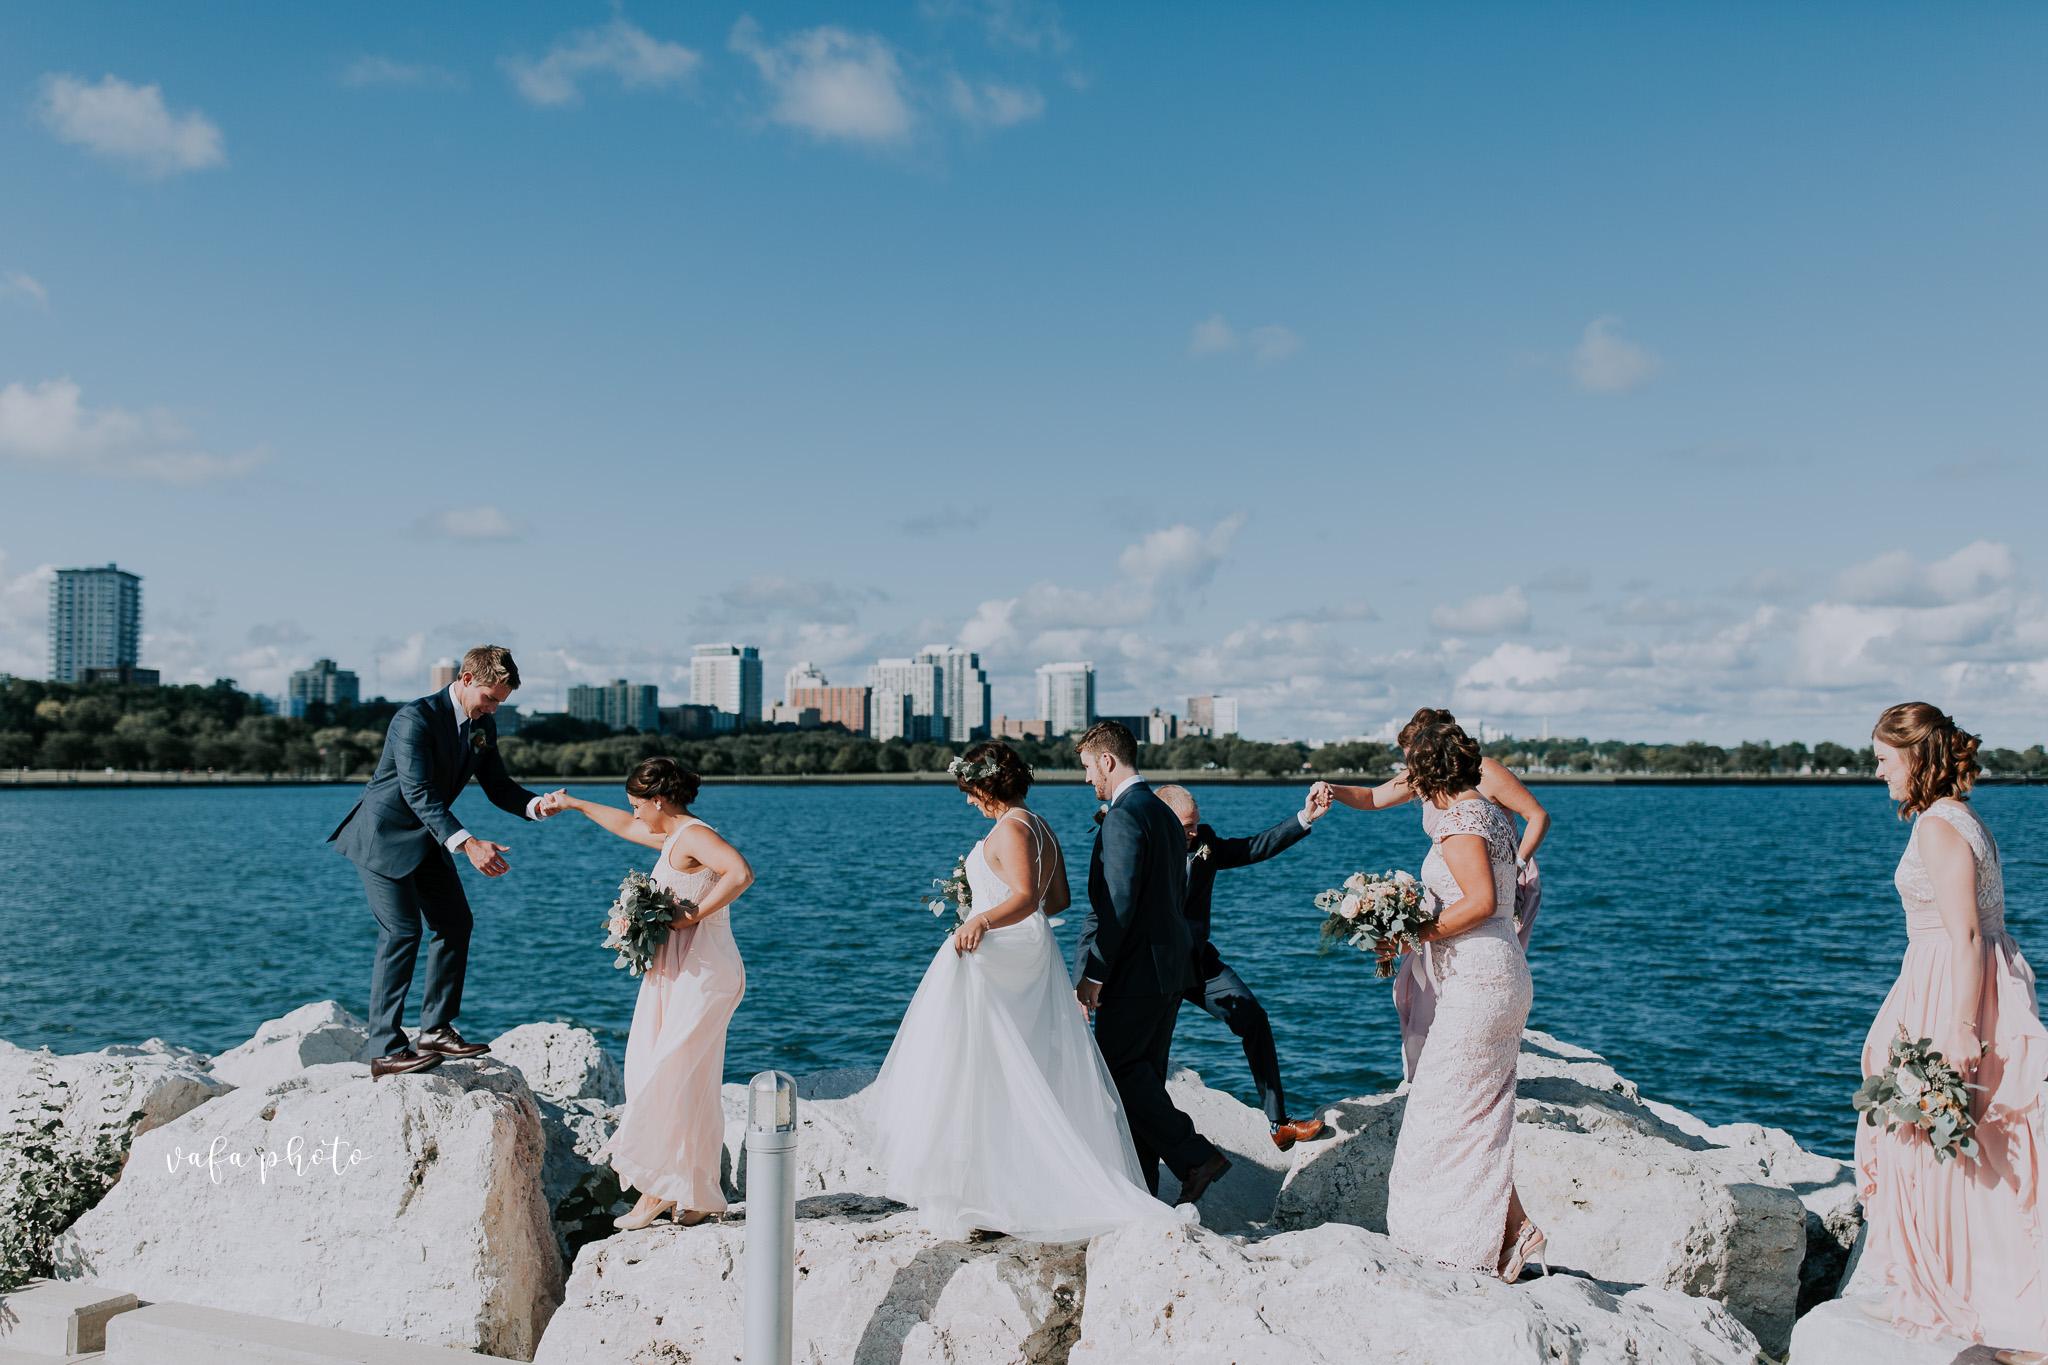 Milwaukee-Athletic-Club-Wedding-Amanda-Tony-Vafa-Photo-539.jpg